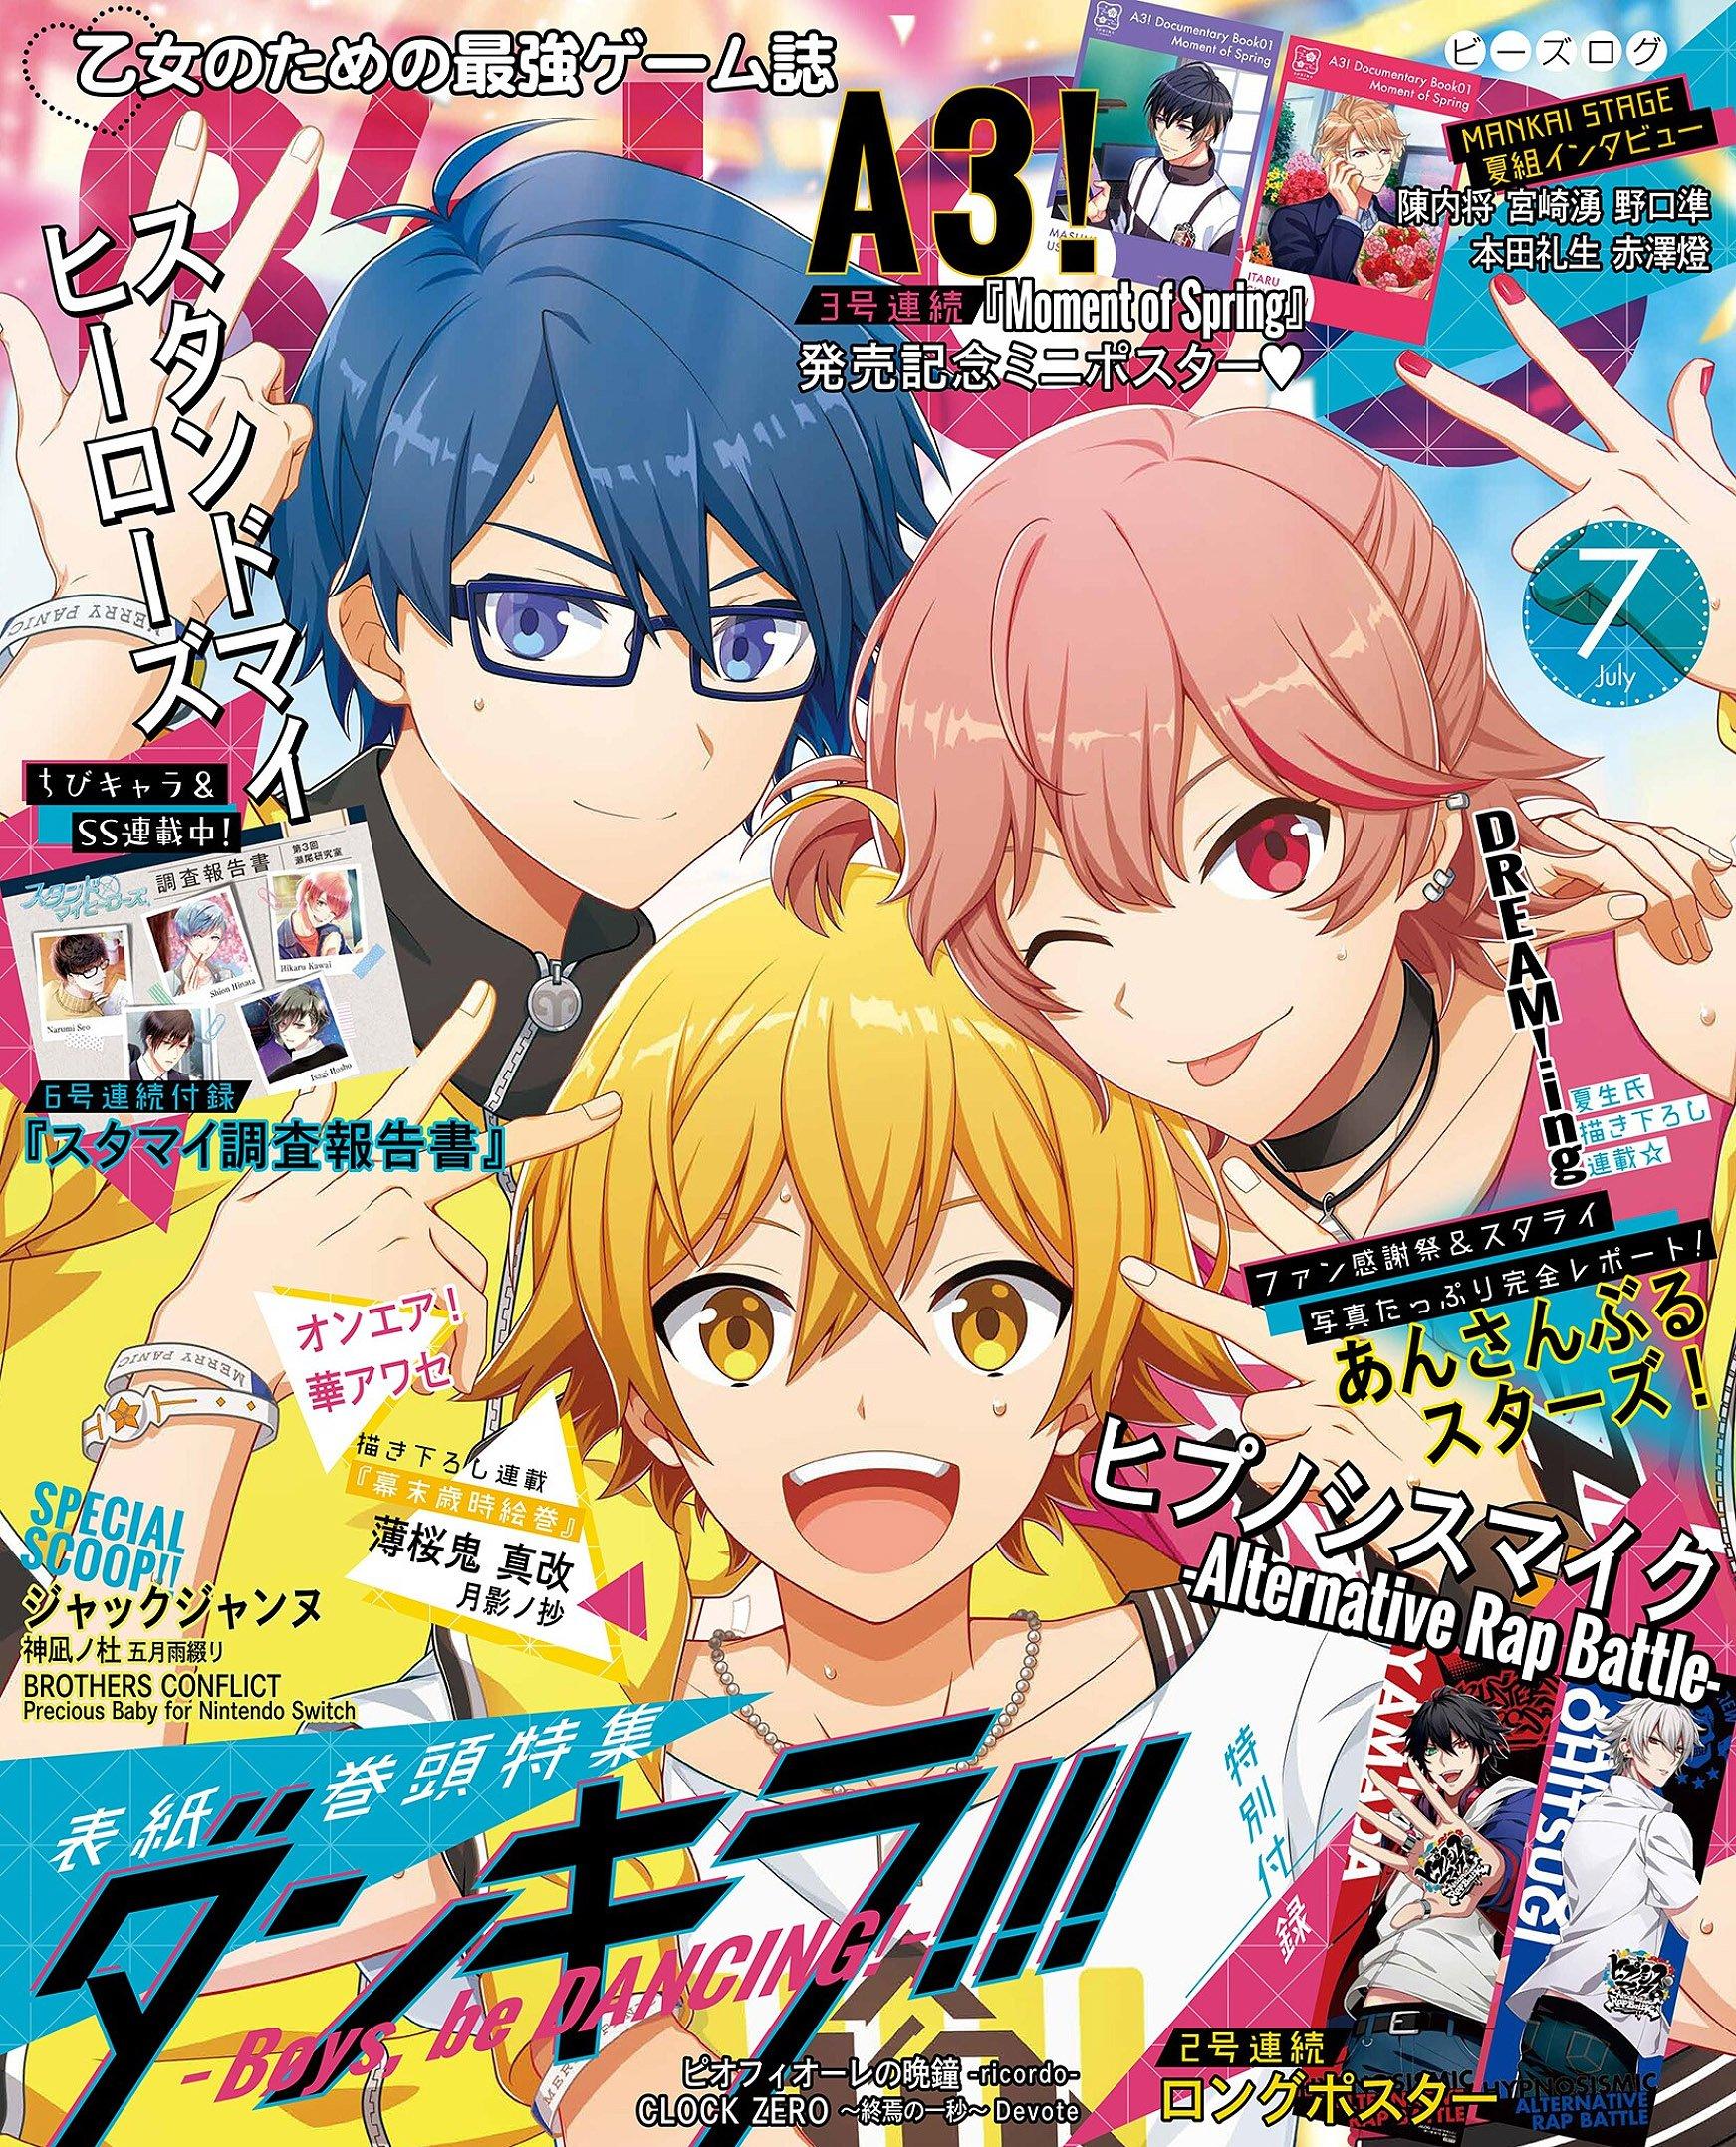 B's-LOG Issue 194 (July 2019)